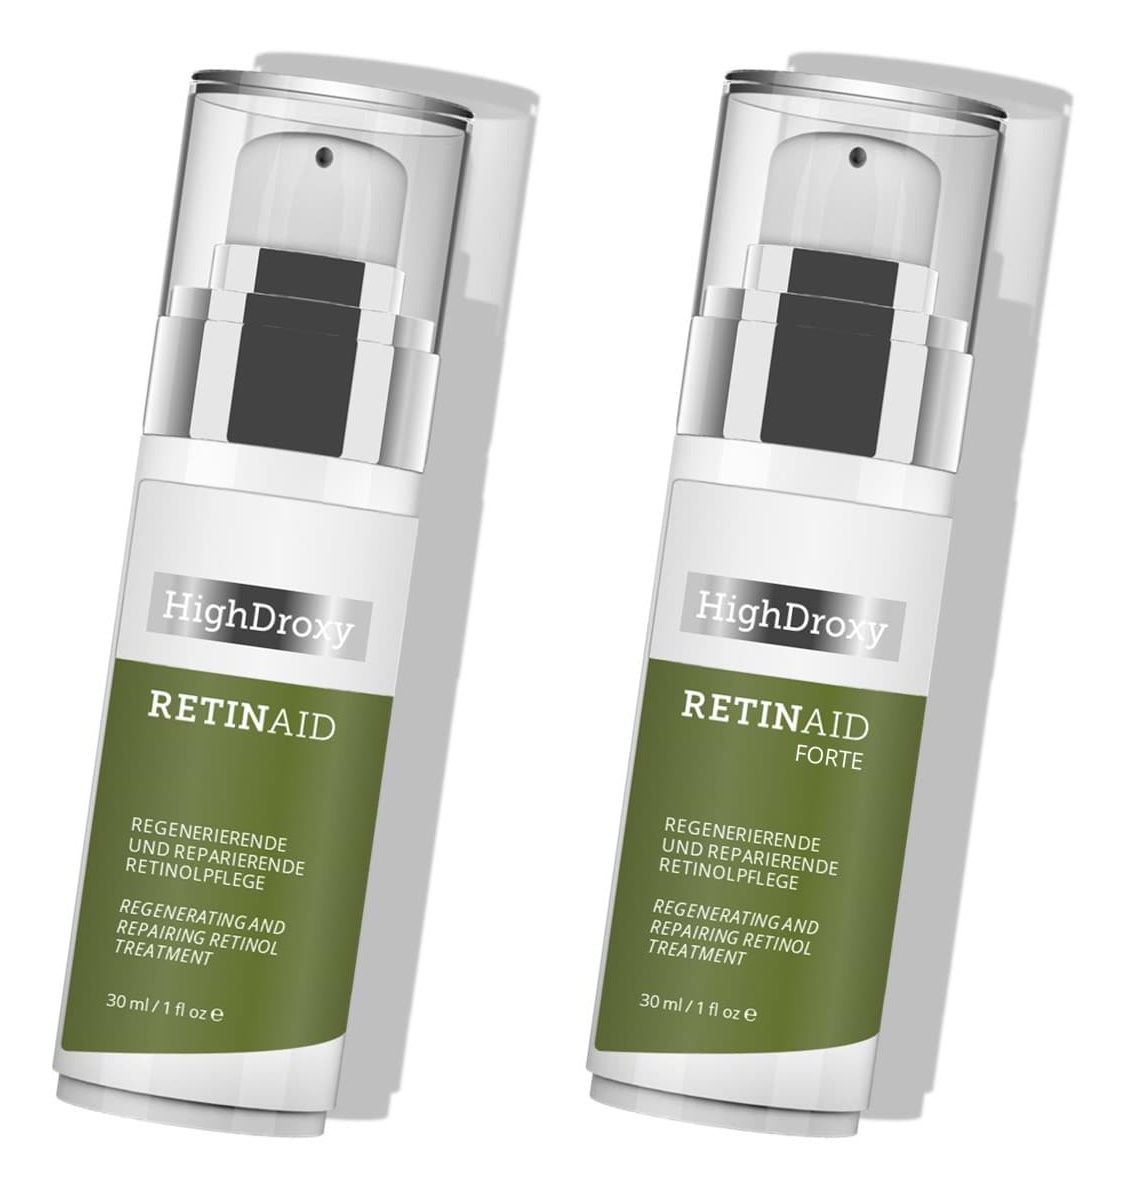 0.5% | Retinaid Forte